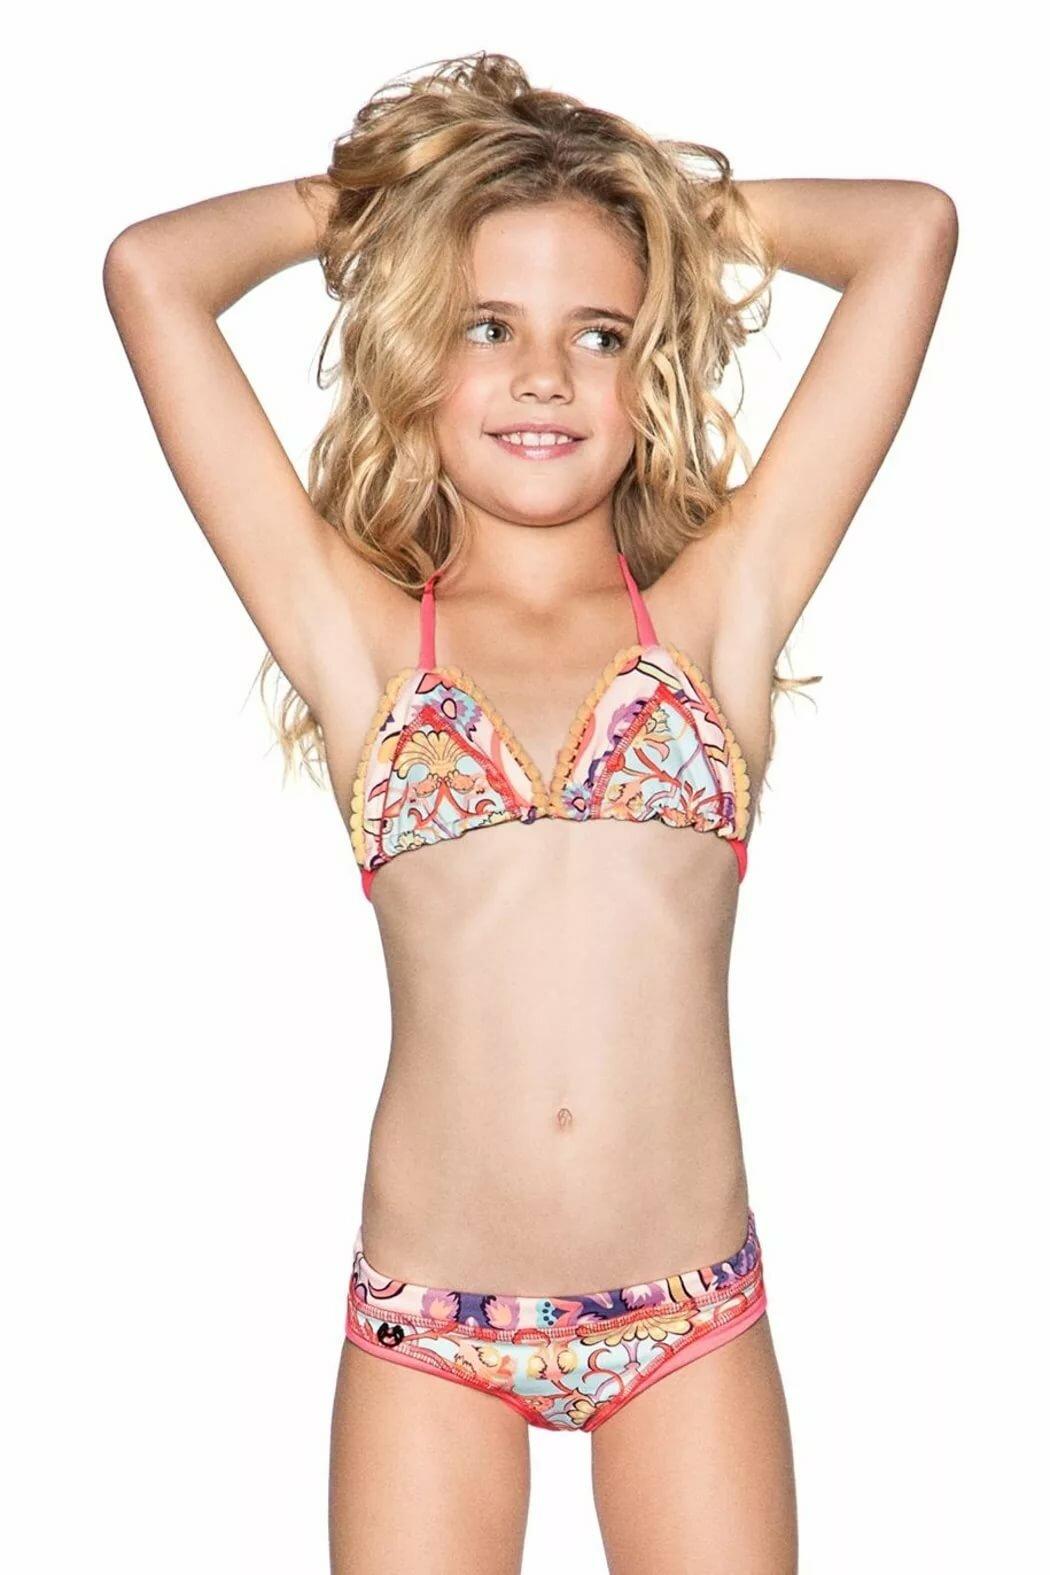 Little girls bikini sexy porn